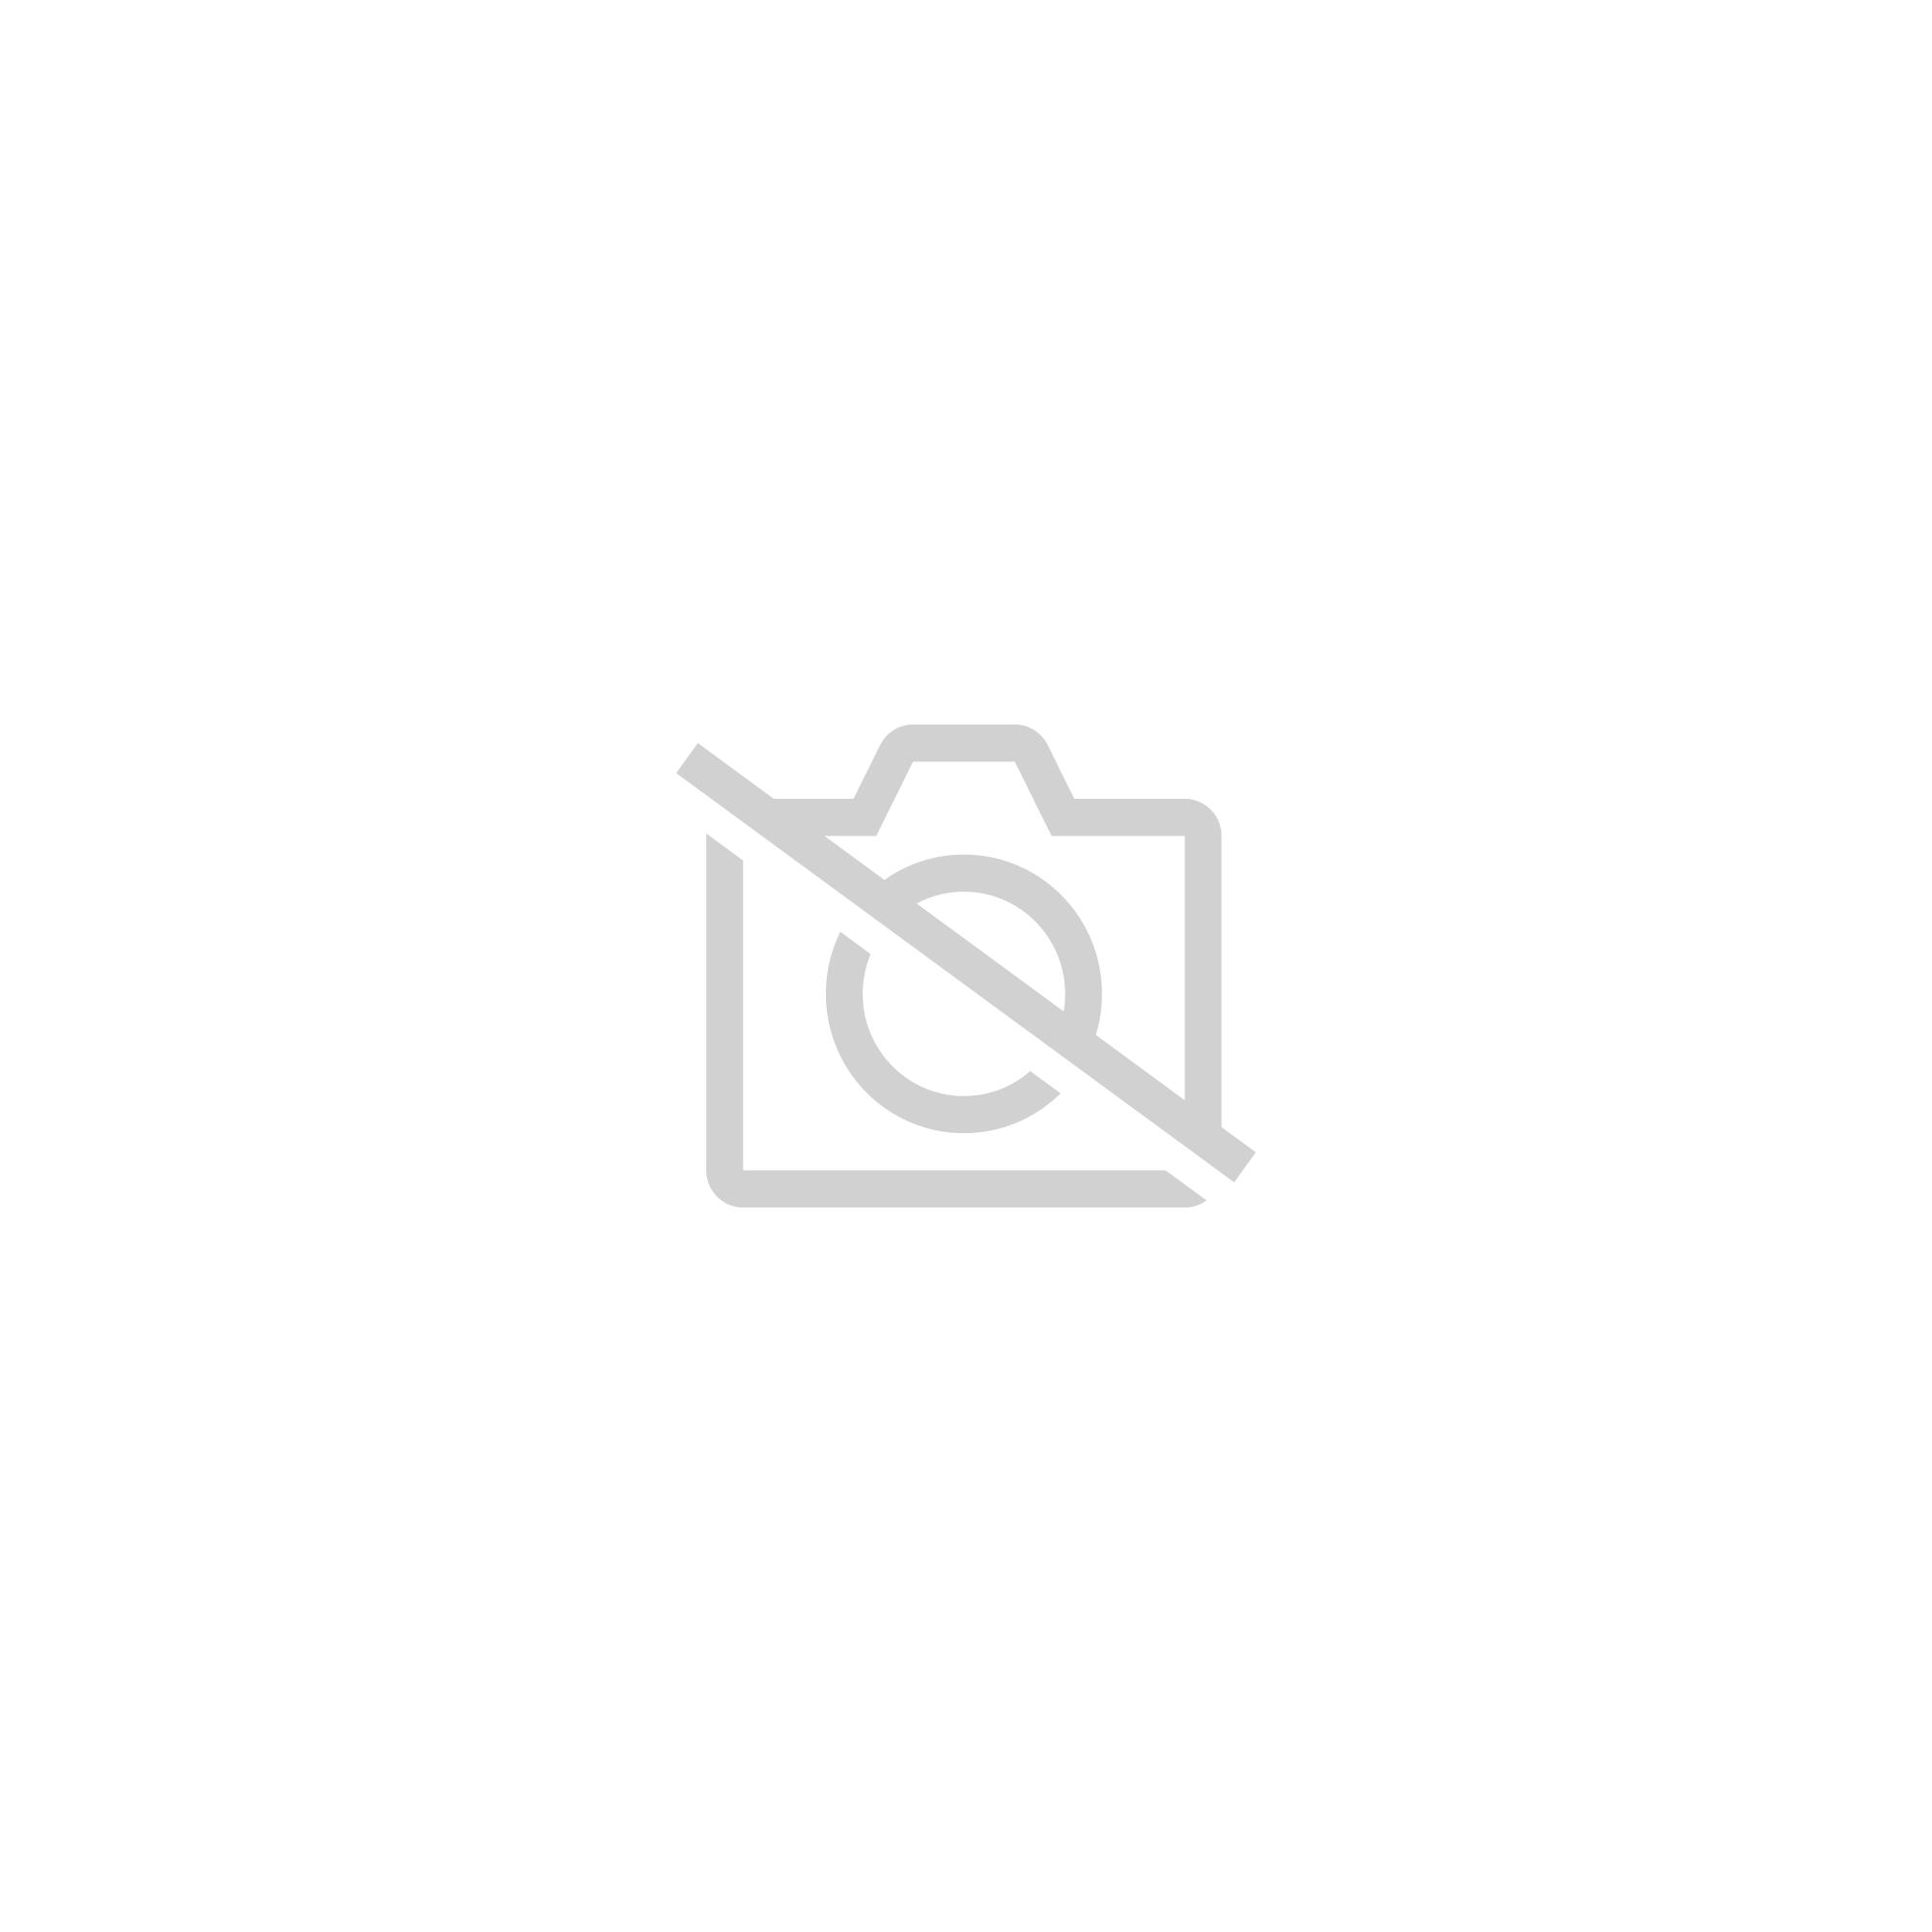 Cocotte minute achat vente neuf d 39 occasion priceminister rak - Cocotte minute aluminium ...